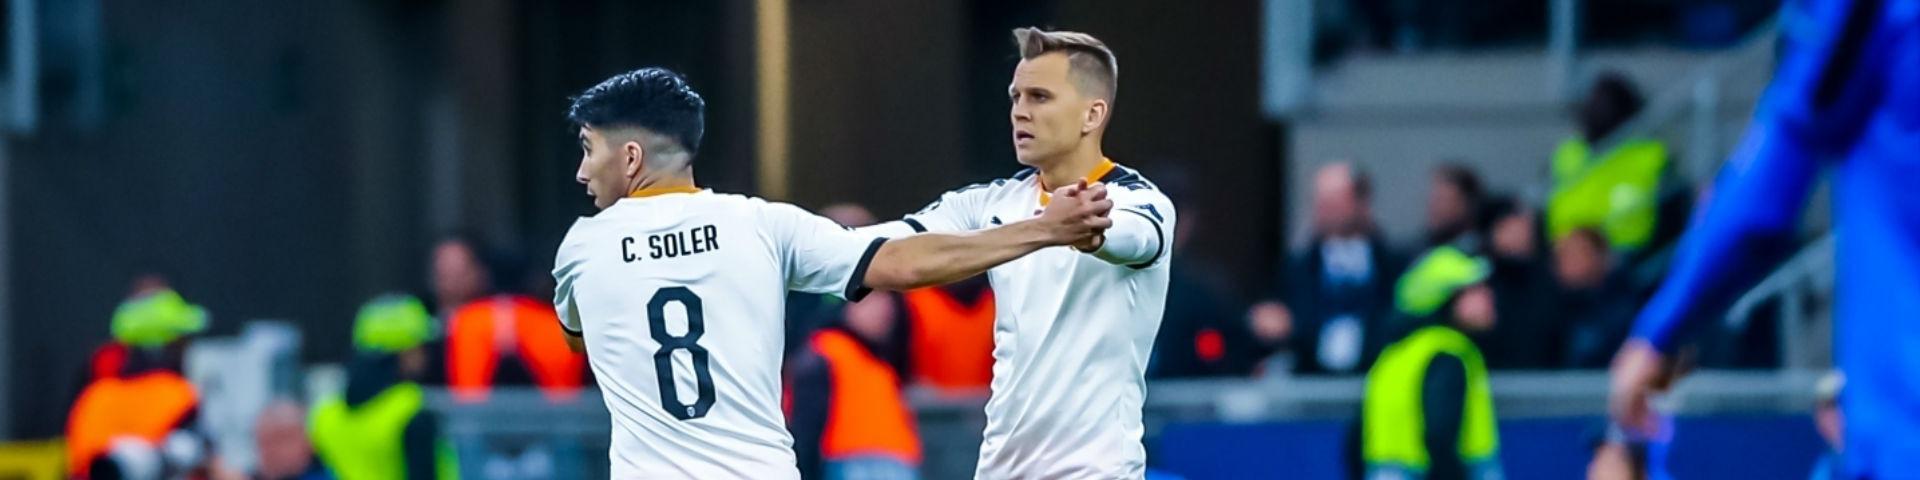 «Аталанта» вынесла «Валенсию», но Черышев забил гол